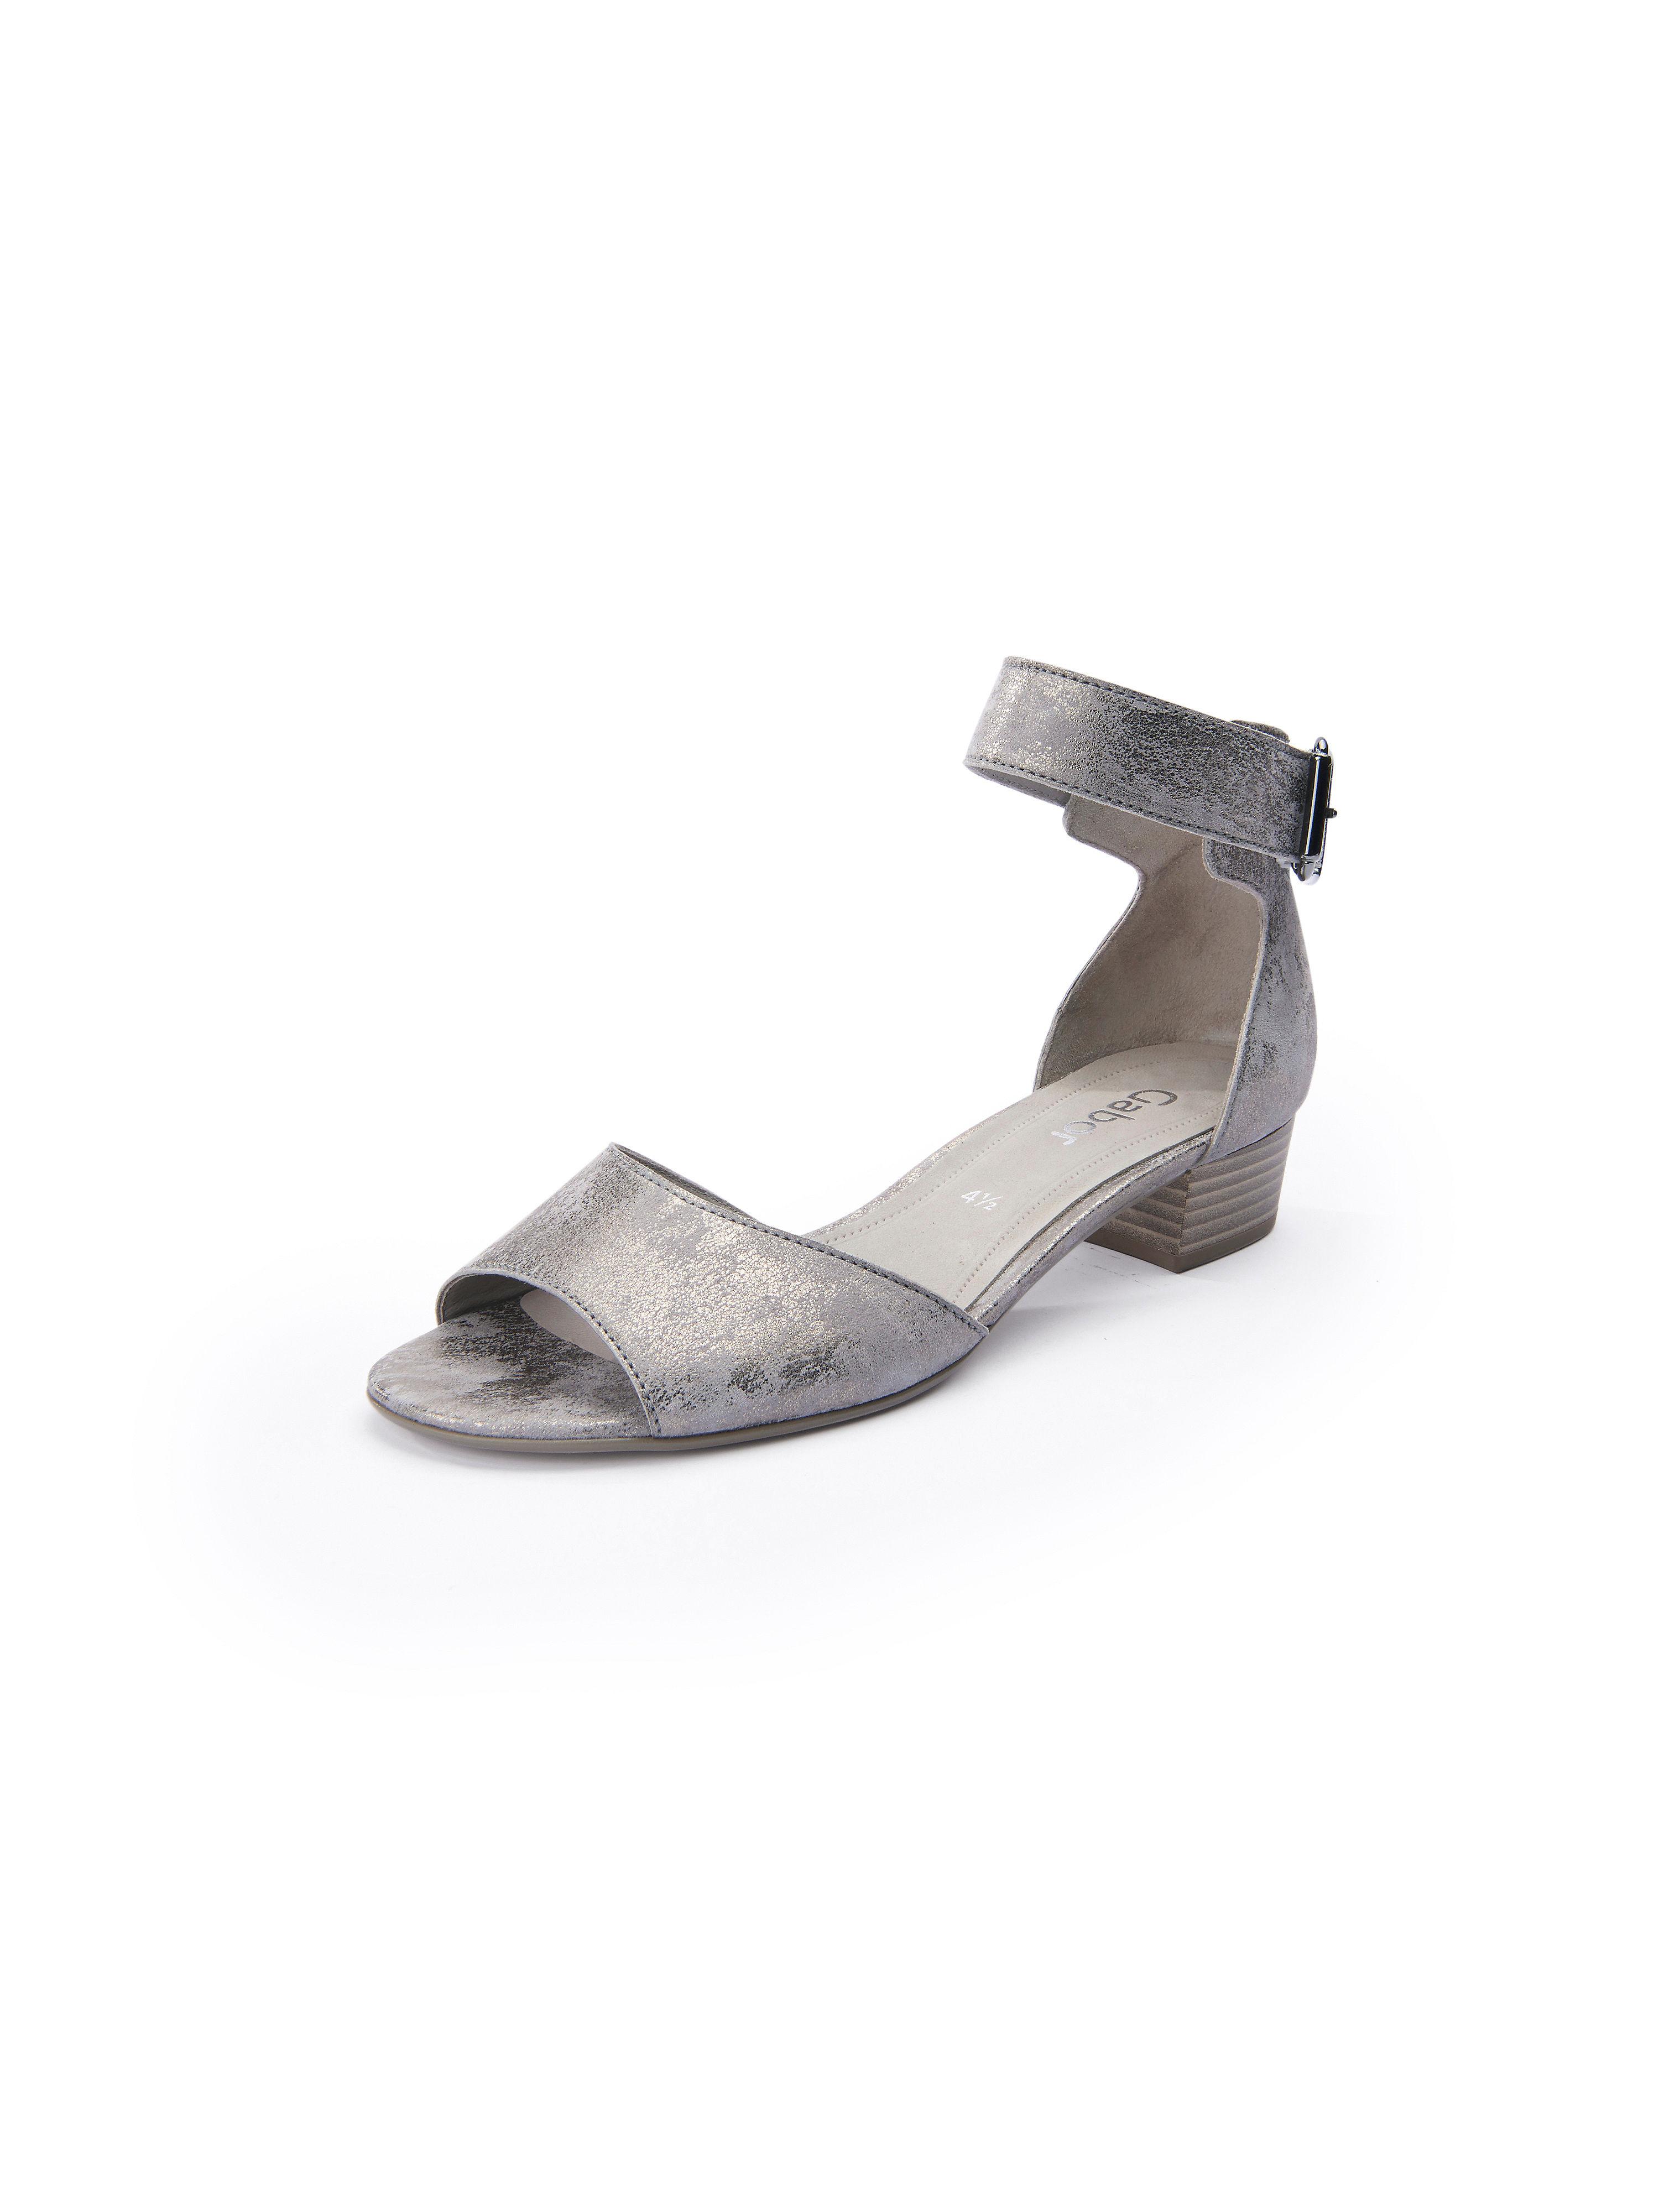 Sandale Metallic-Effekt Gabor beige Größe: 35